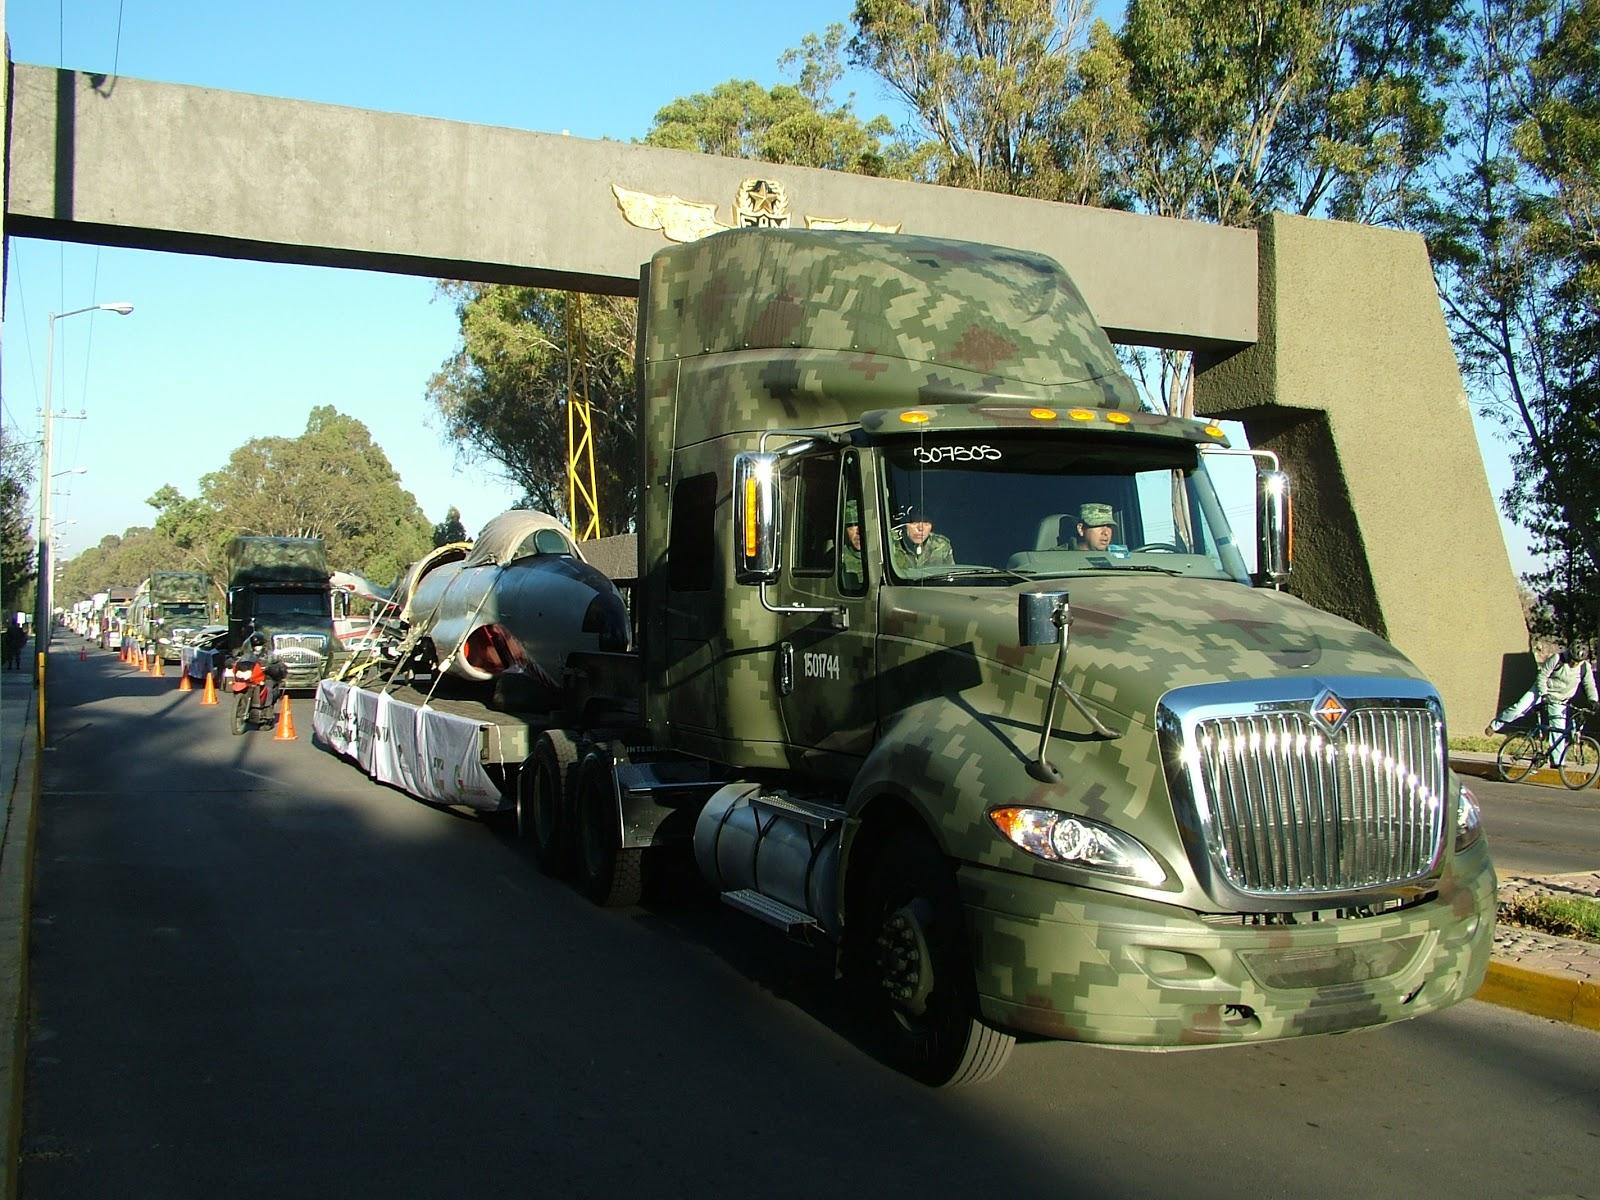 agencias de vehiculos centros - photo #3